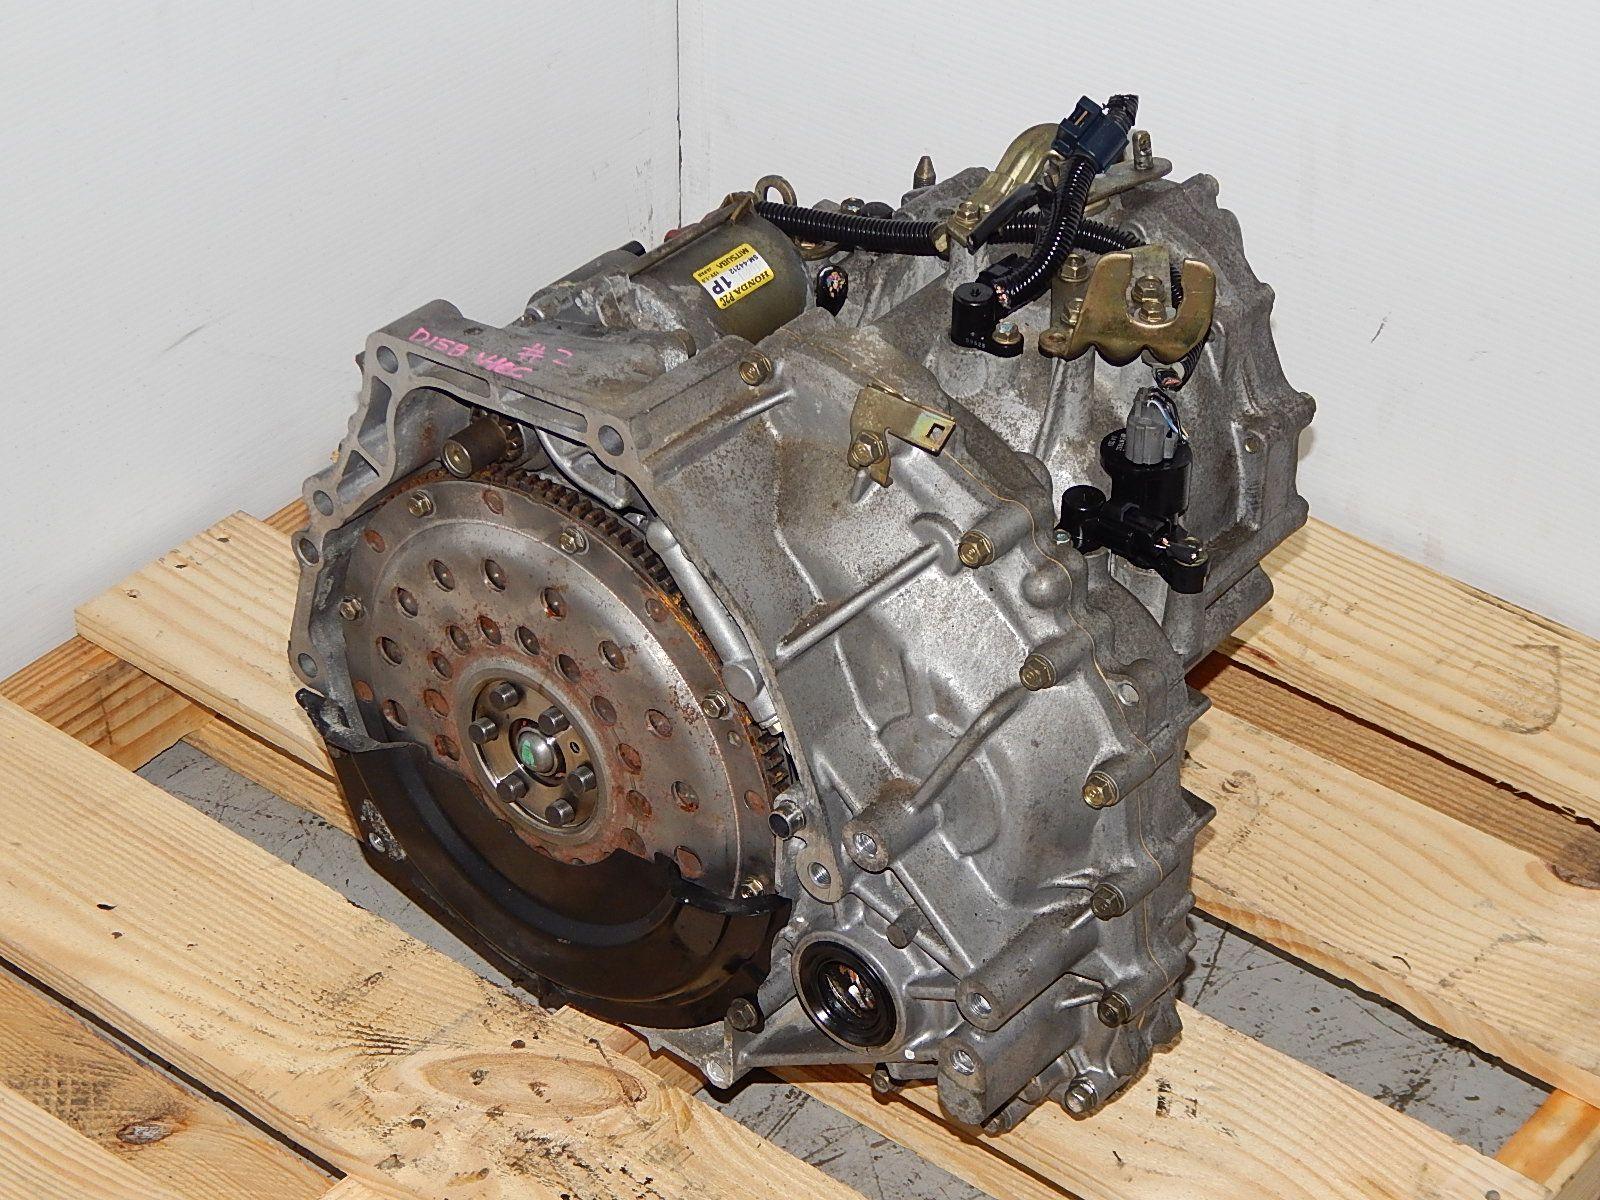 2001 Honda Civic Parts Diagram Jeep Grand Cherokee Radio Wiring Transmission